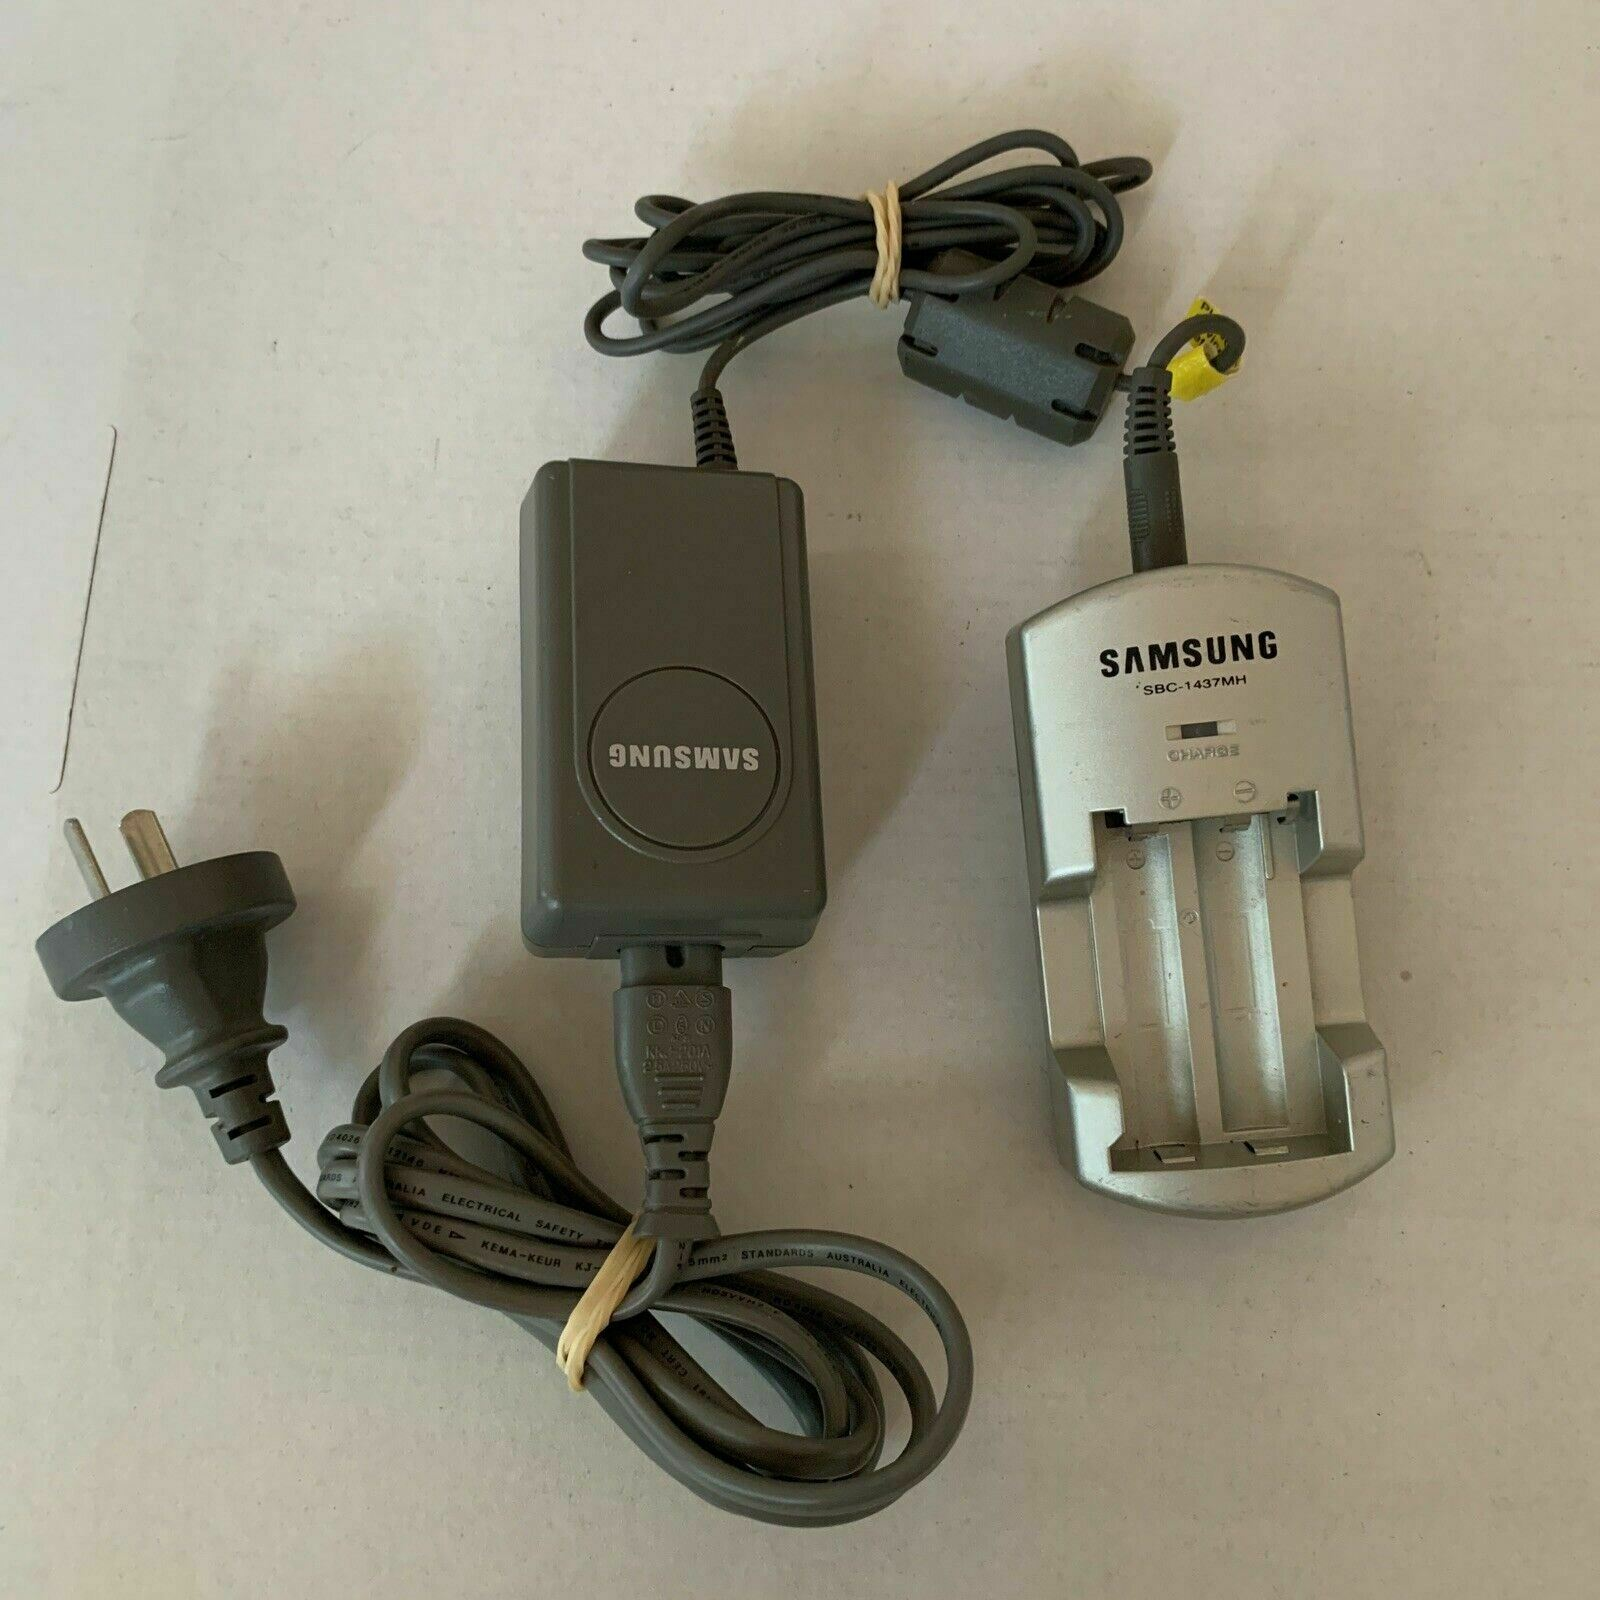 Samsung SBC-1437MH Battery Charger SBC-1437 for SBC-N1 Battery